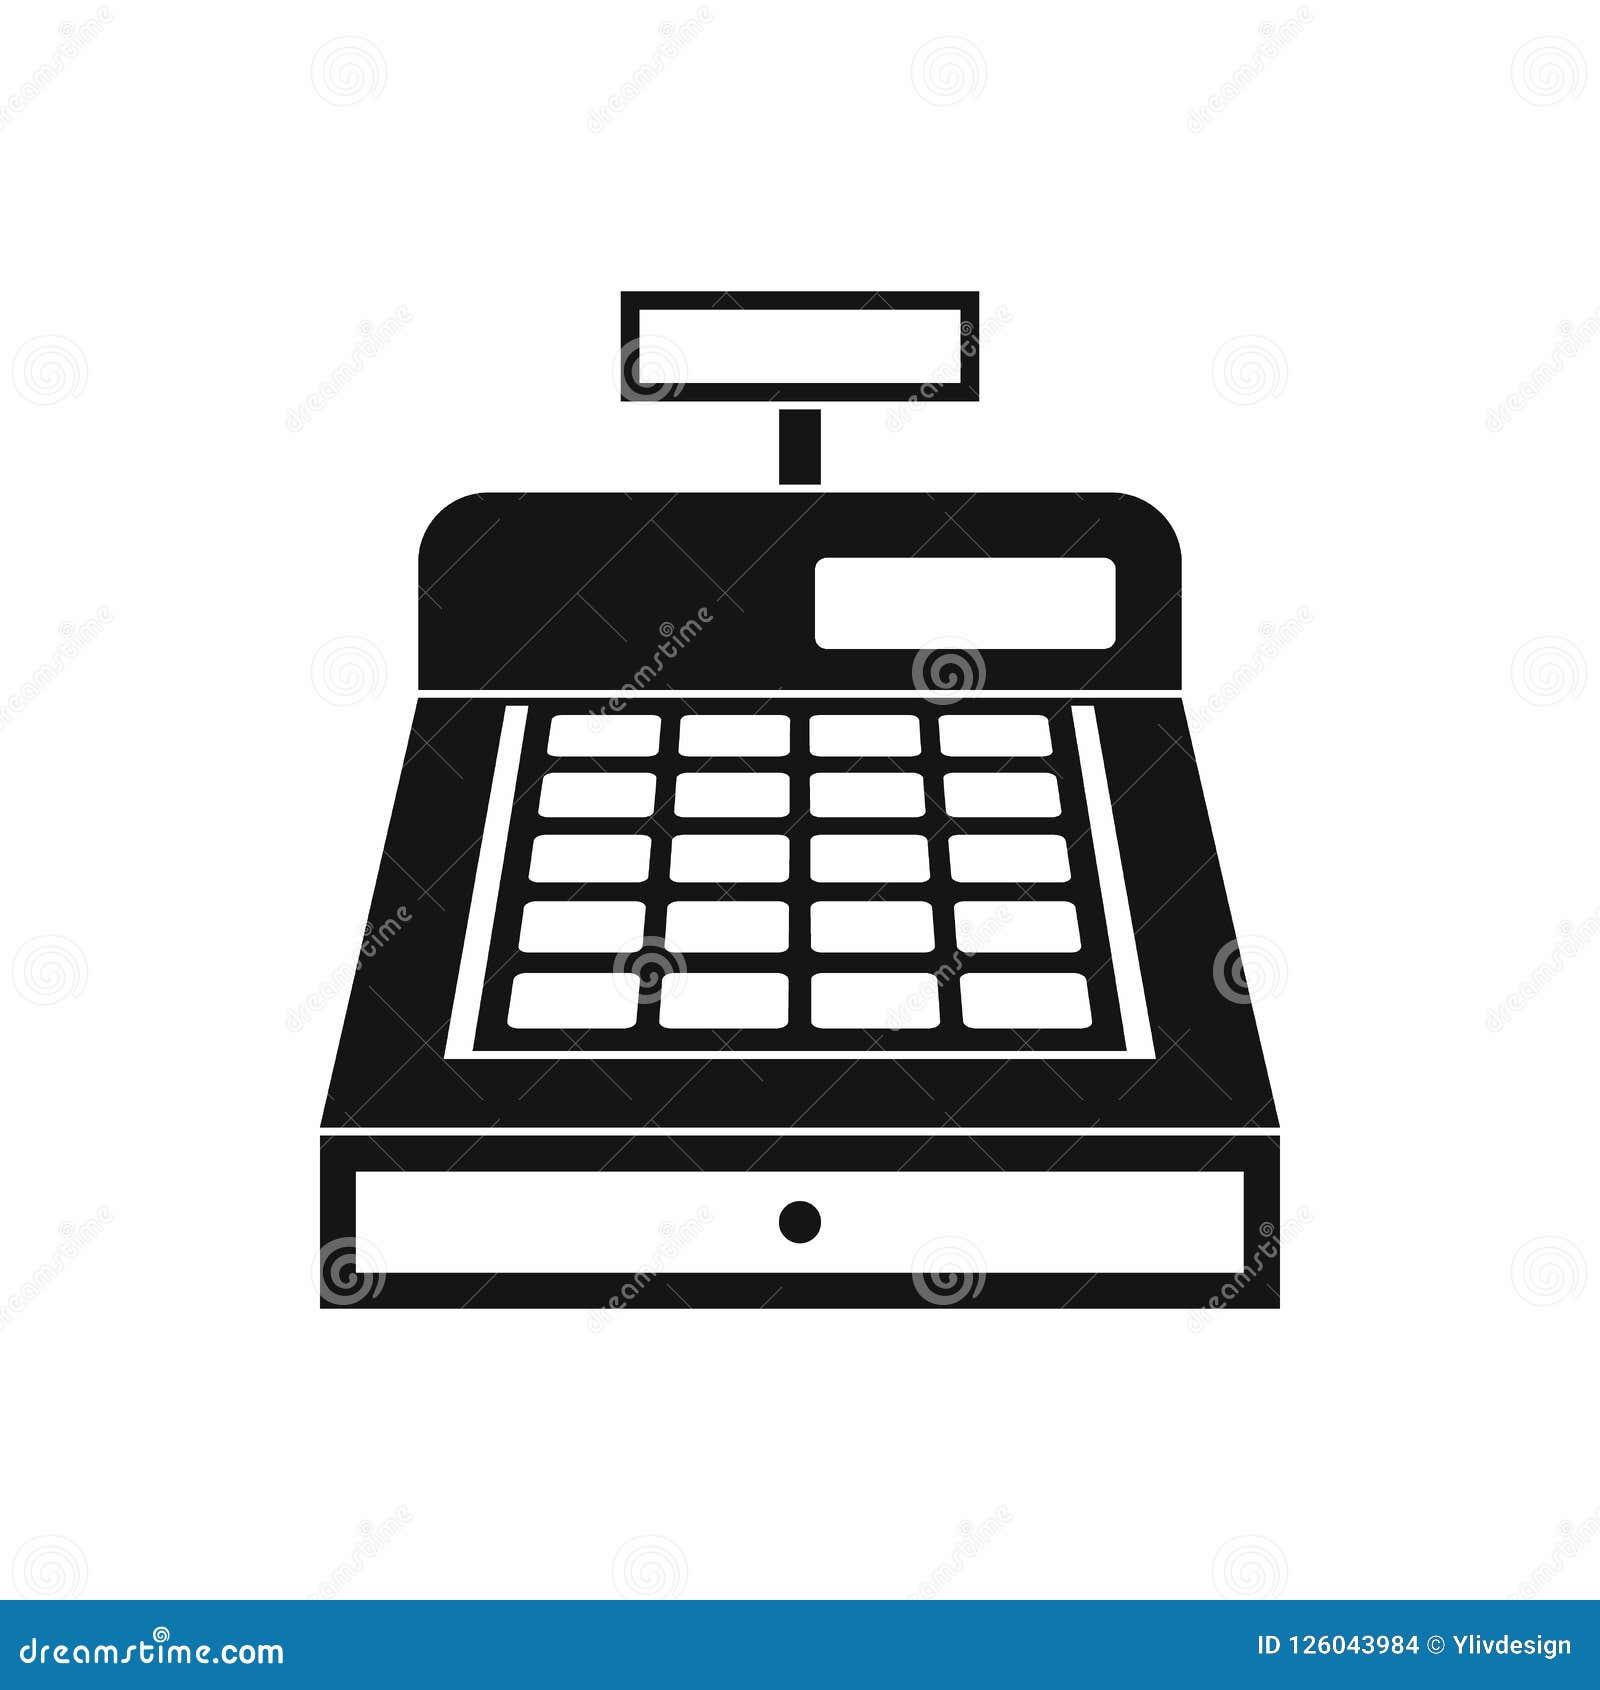 cash register icon simple style stock illustration illustration